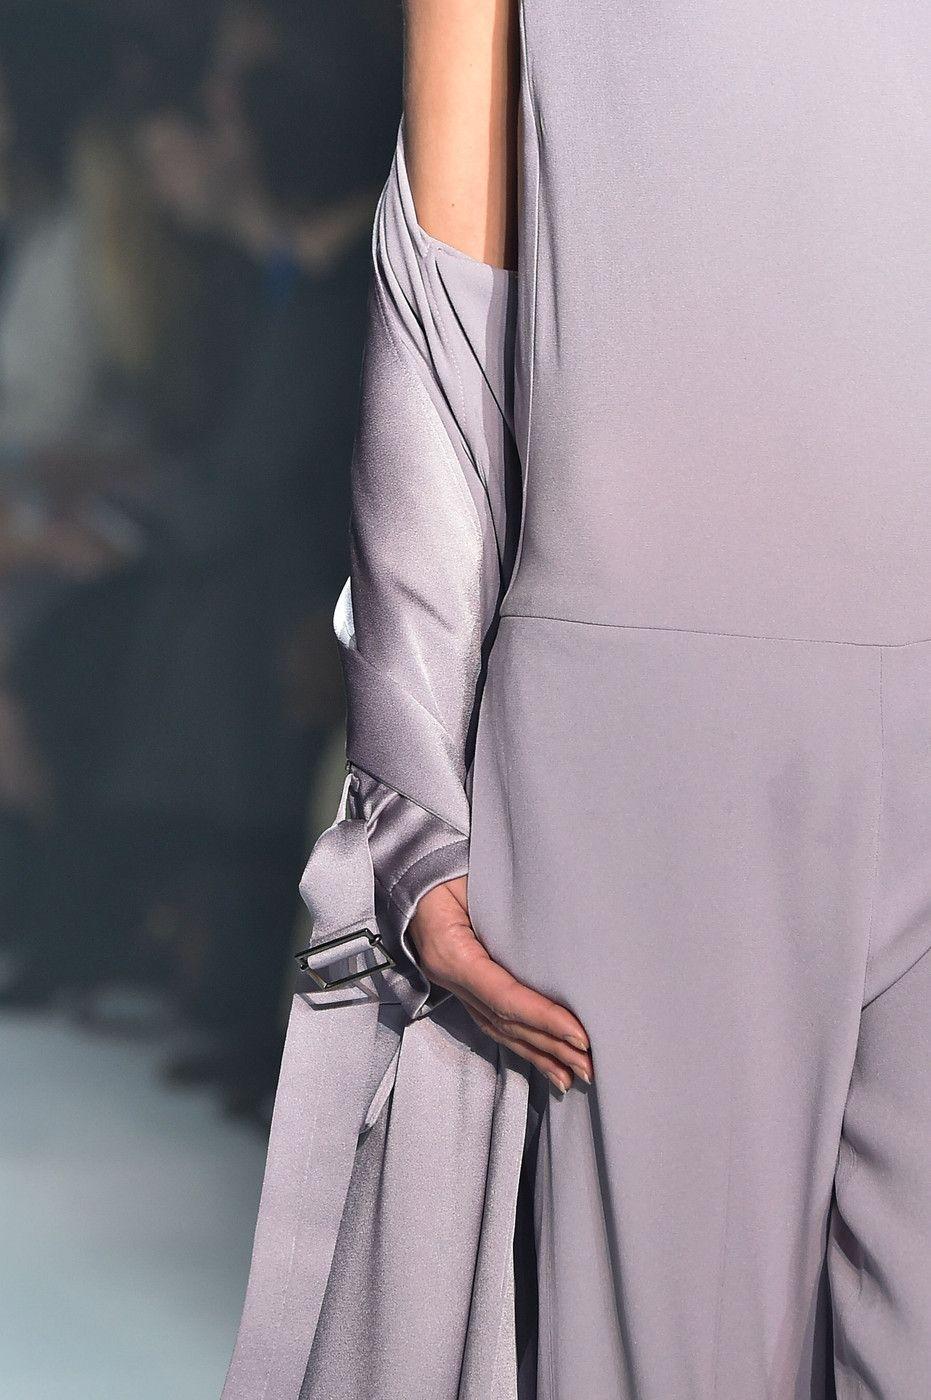 Haider Ackermann at Paris Fashion Week Spring 2015.